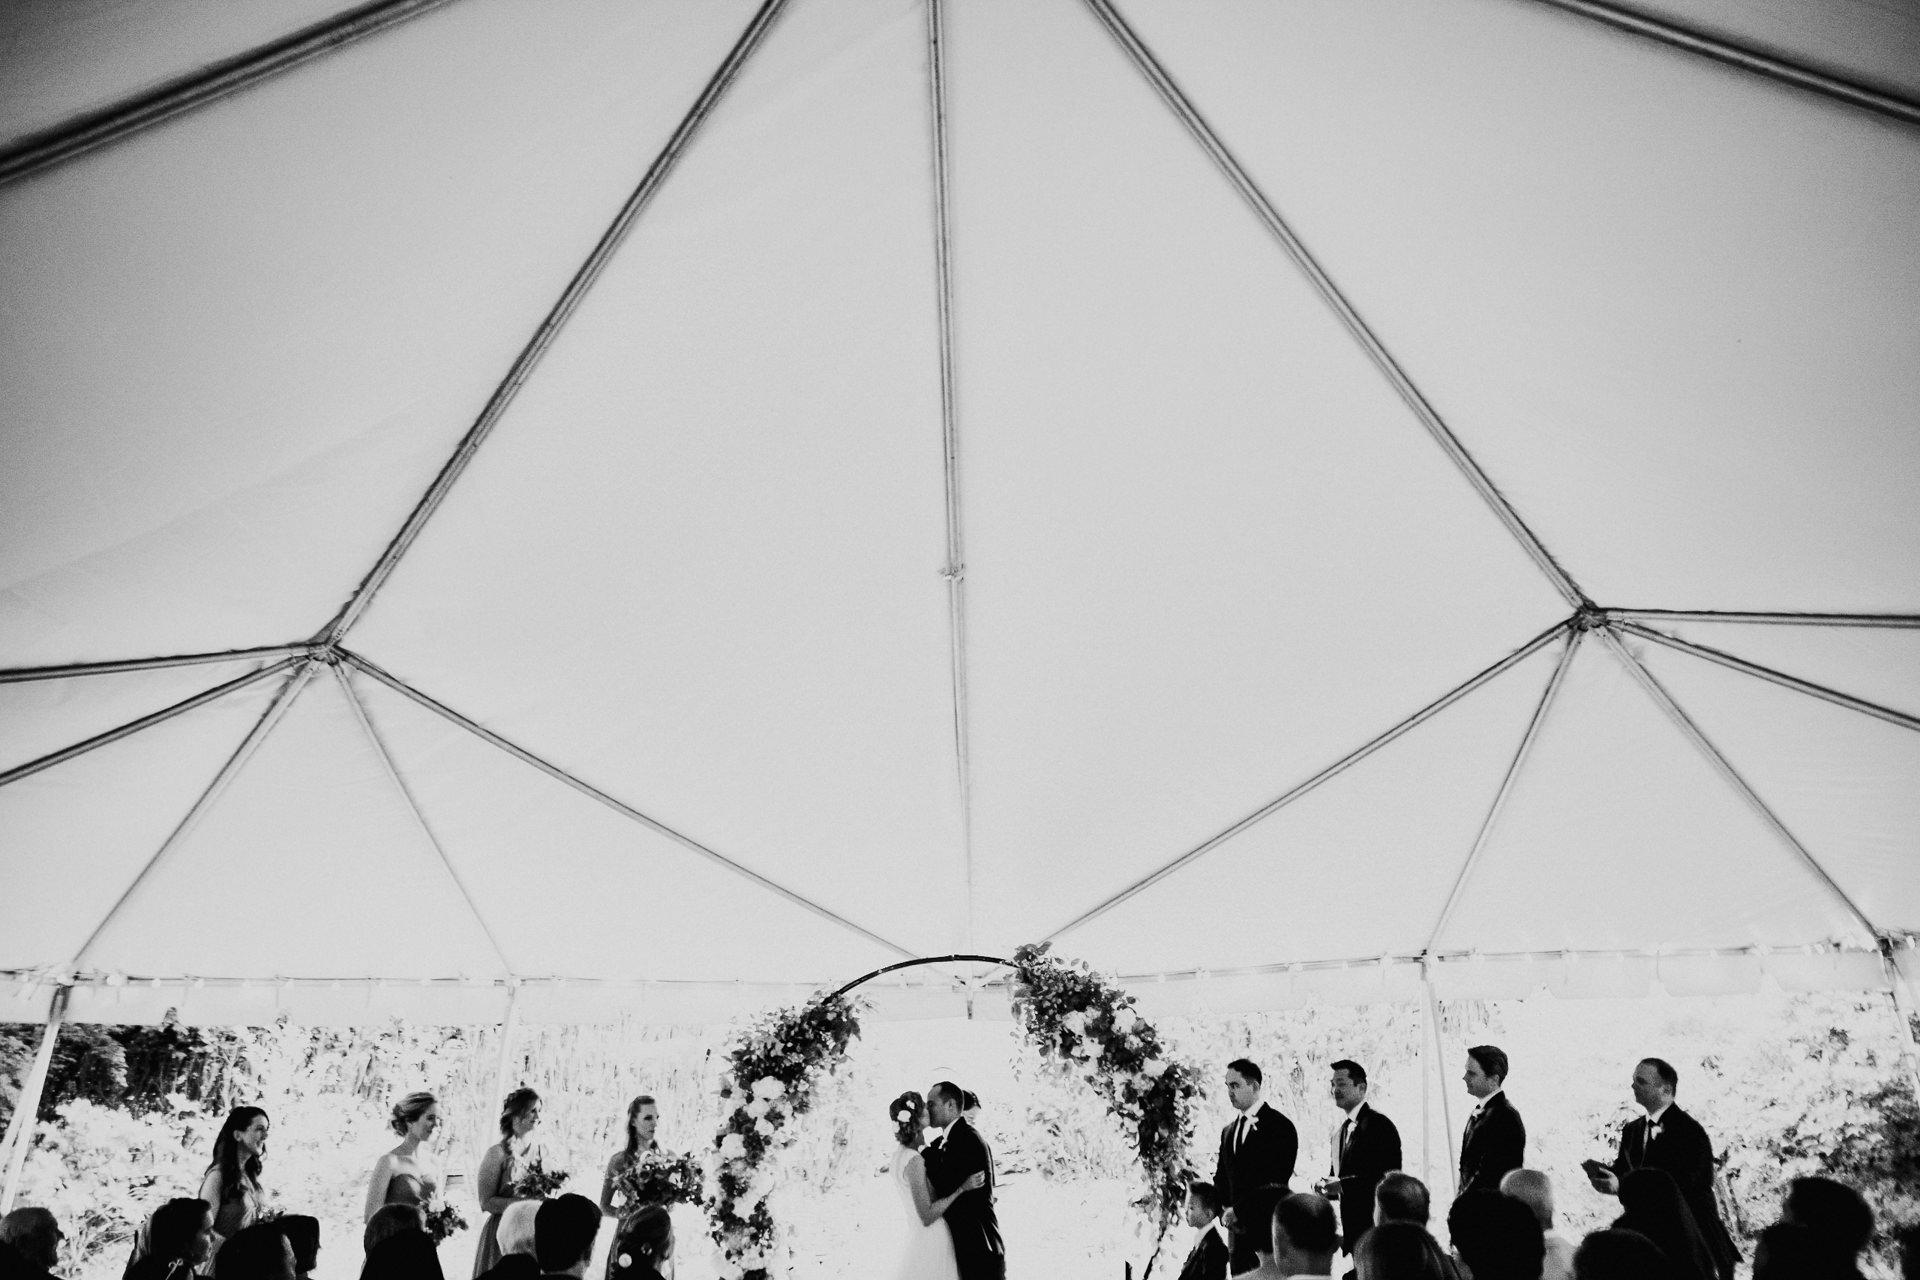 Airlie The Warrenton VA Hotel, Conference Center and Event Venue Wedding Photographer Mantas Kubilinskas-22.jpg